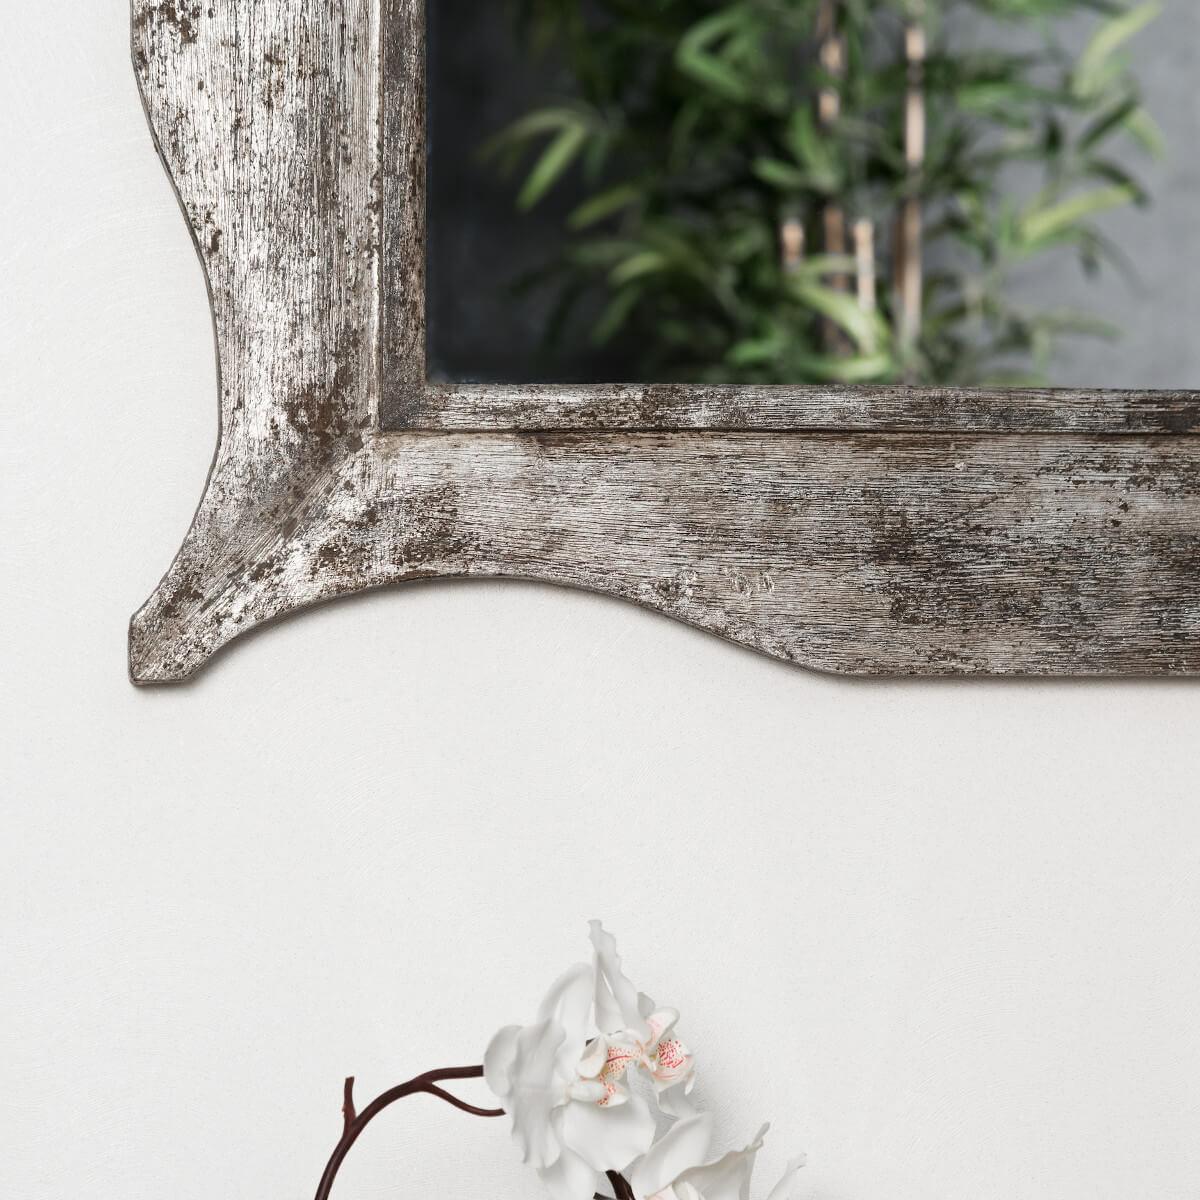 Miroir moderne en bois patin bronze 70 x 100cm ebay for Miroir xxl bois